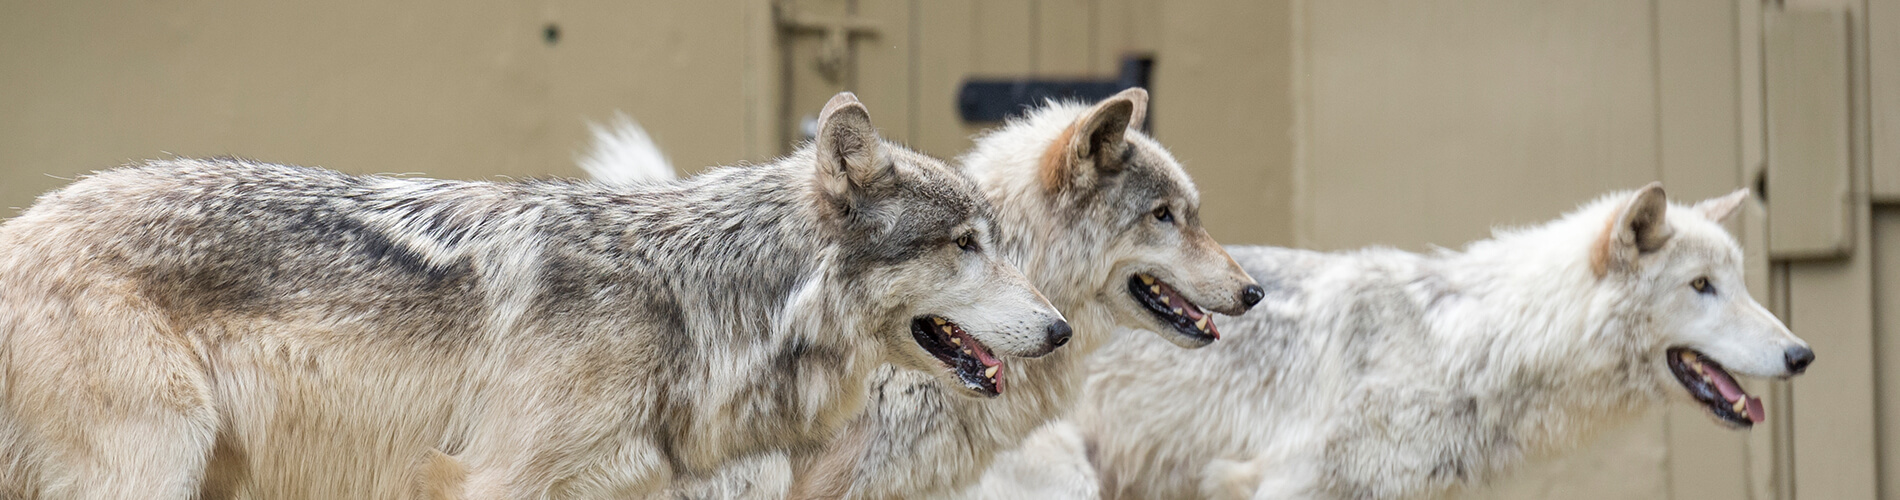 Howl to Coexist - Animal Presentation